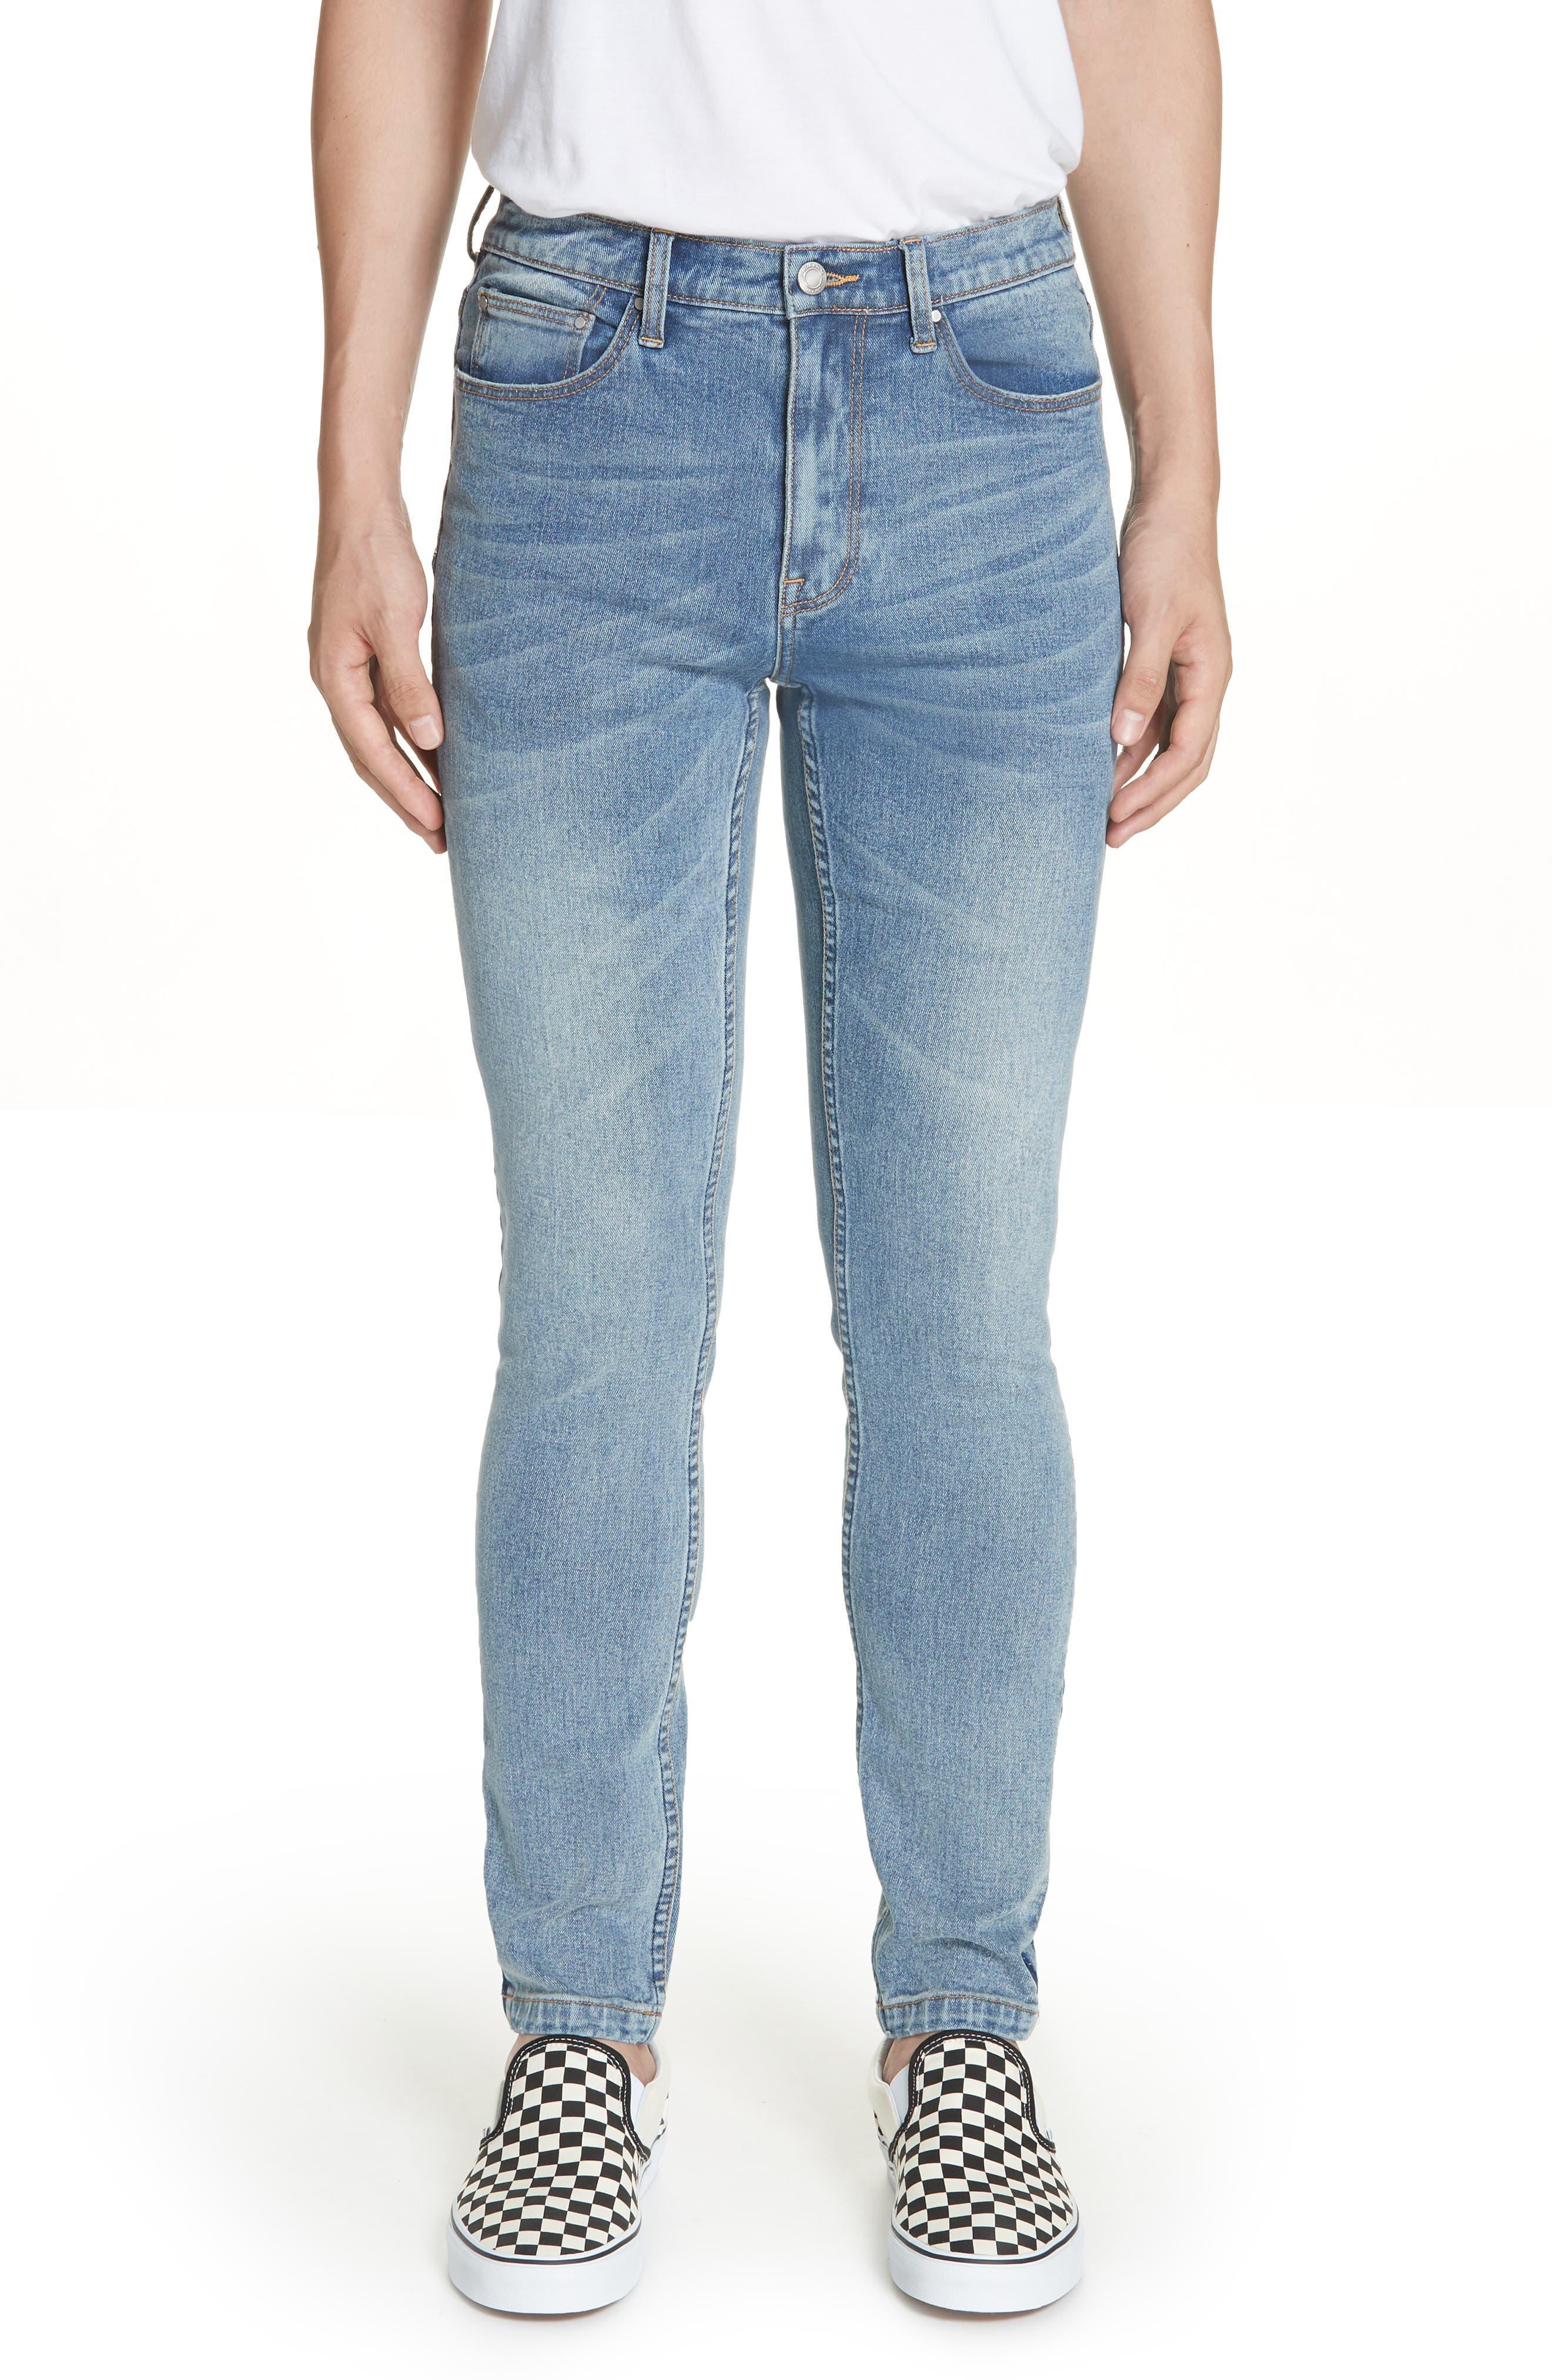 OVADIA & SONS OS-1 Slim Fit Jeans, Main, color, INDIGO